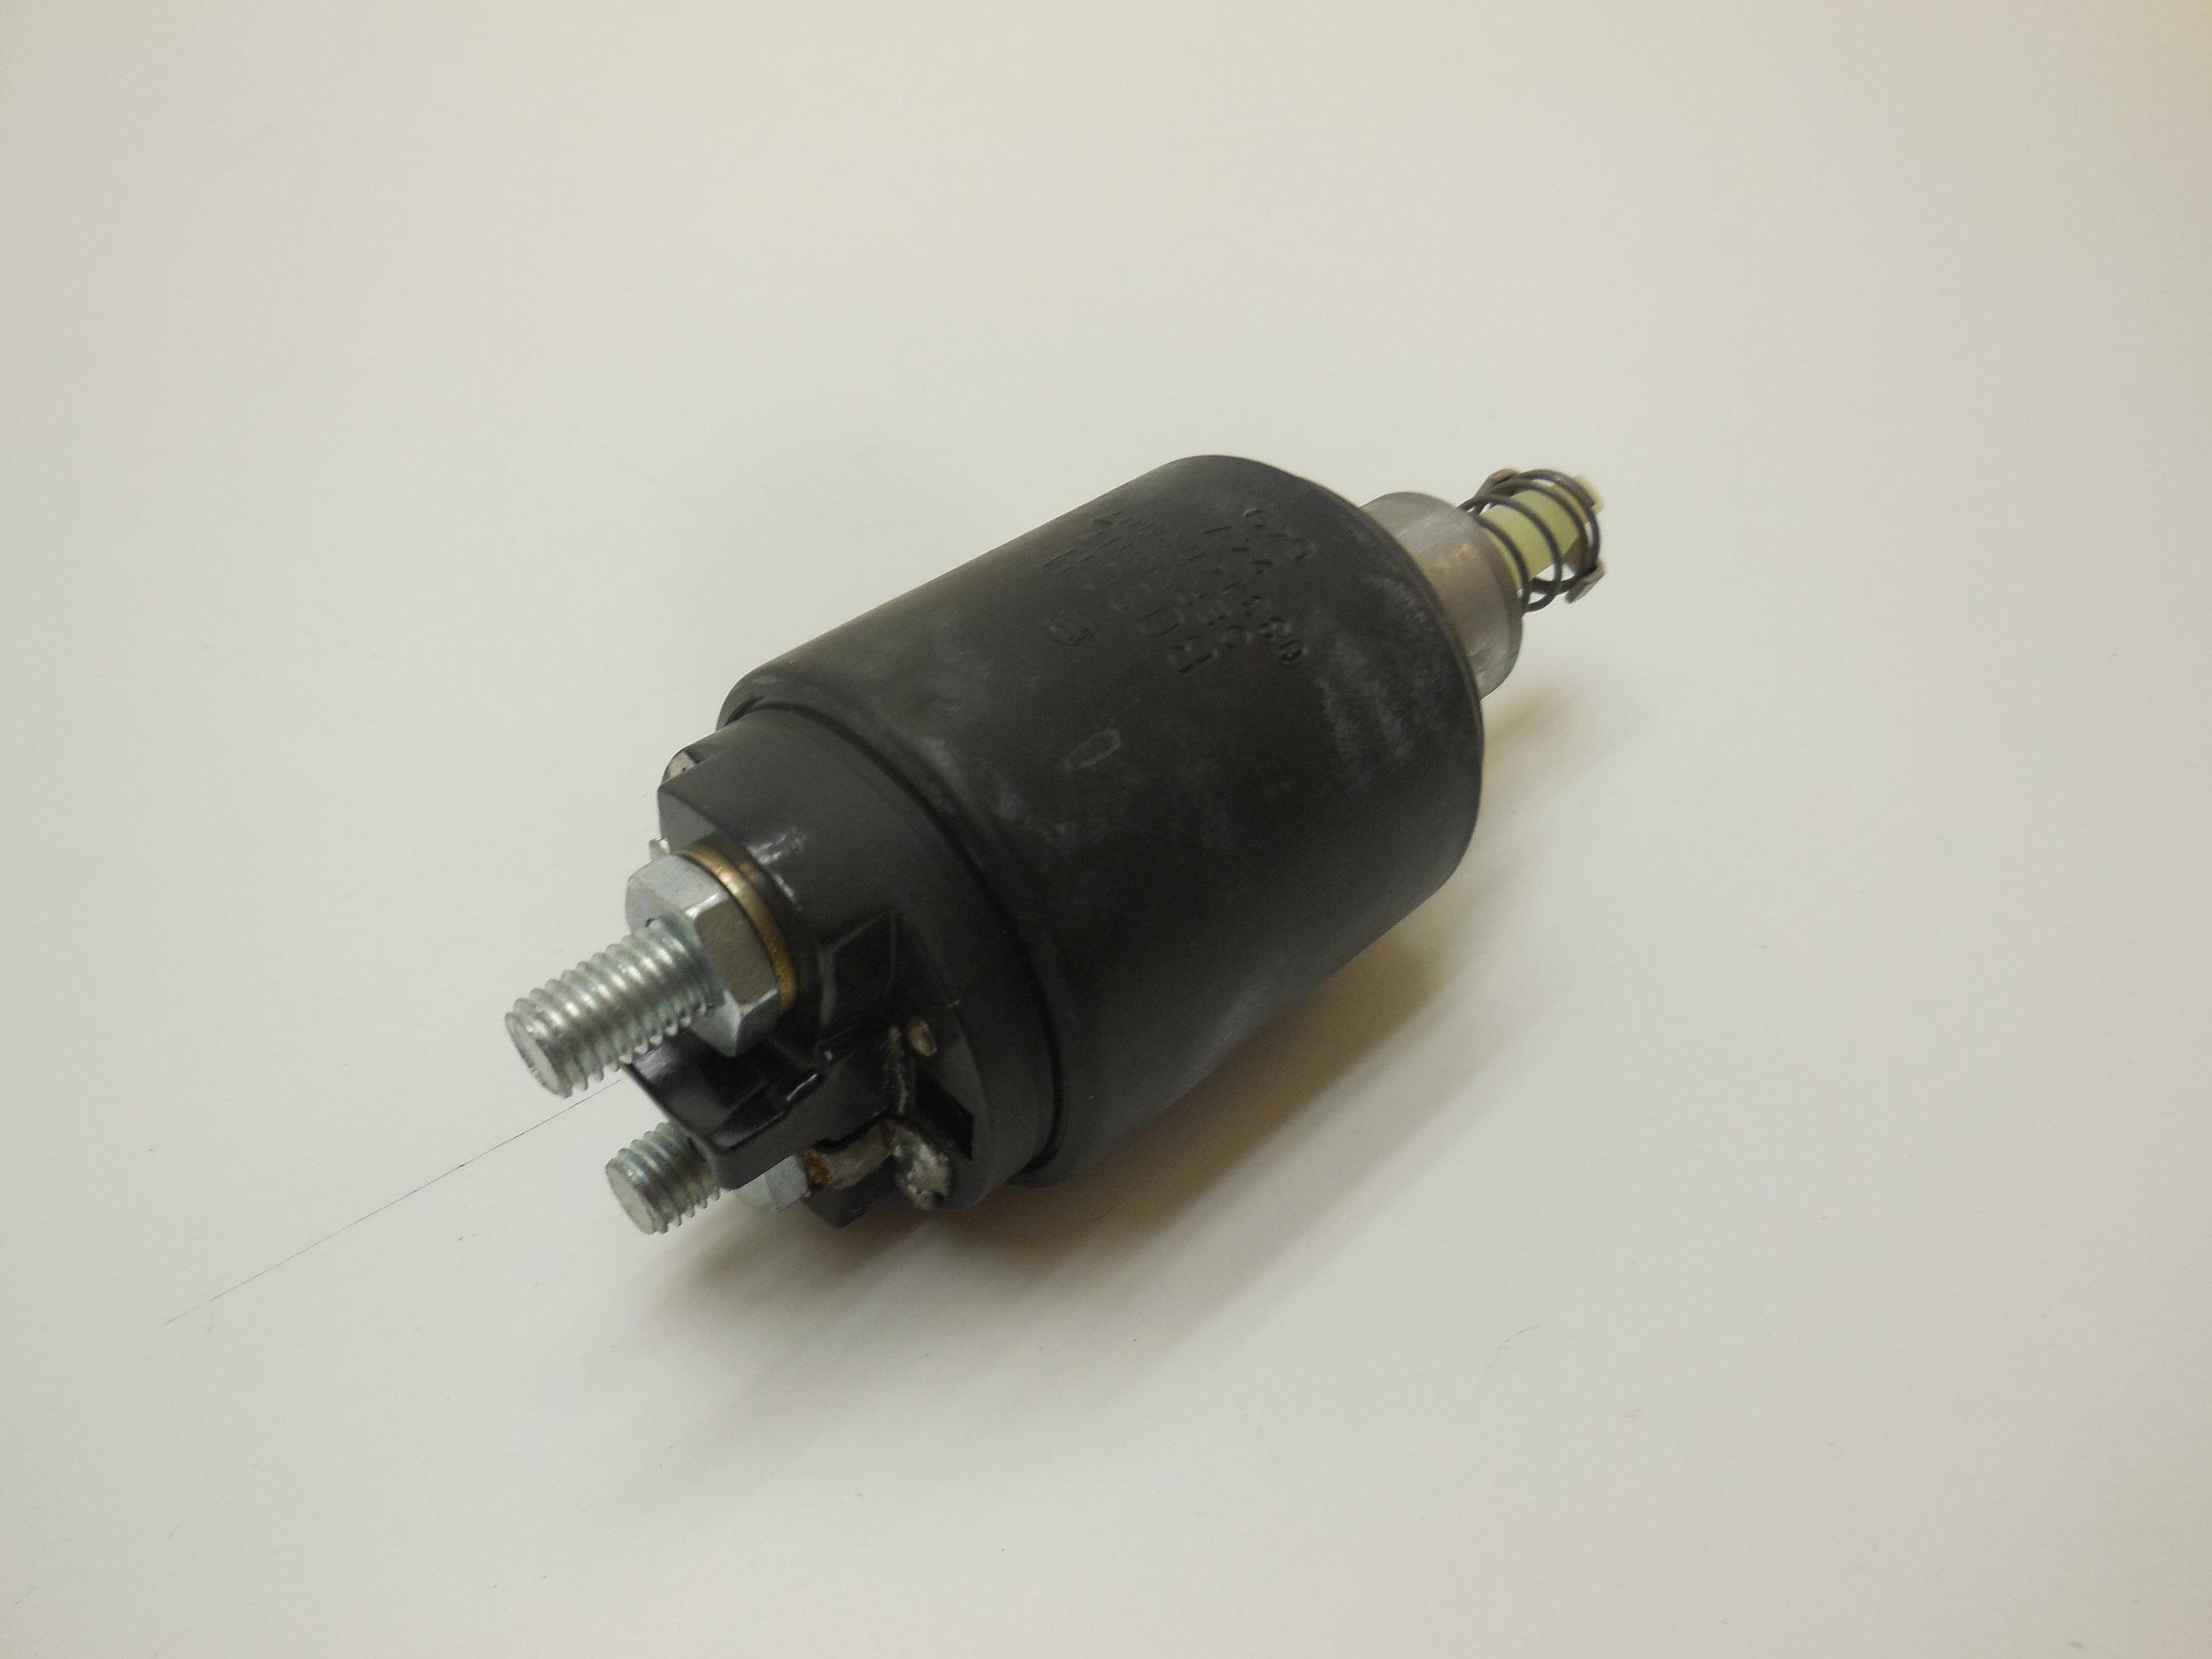 solenoid switch Mb nr: 000 152 43 10 Bosch nr: 0331402007 price: 350 Sek